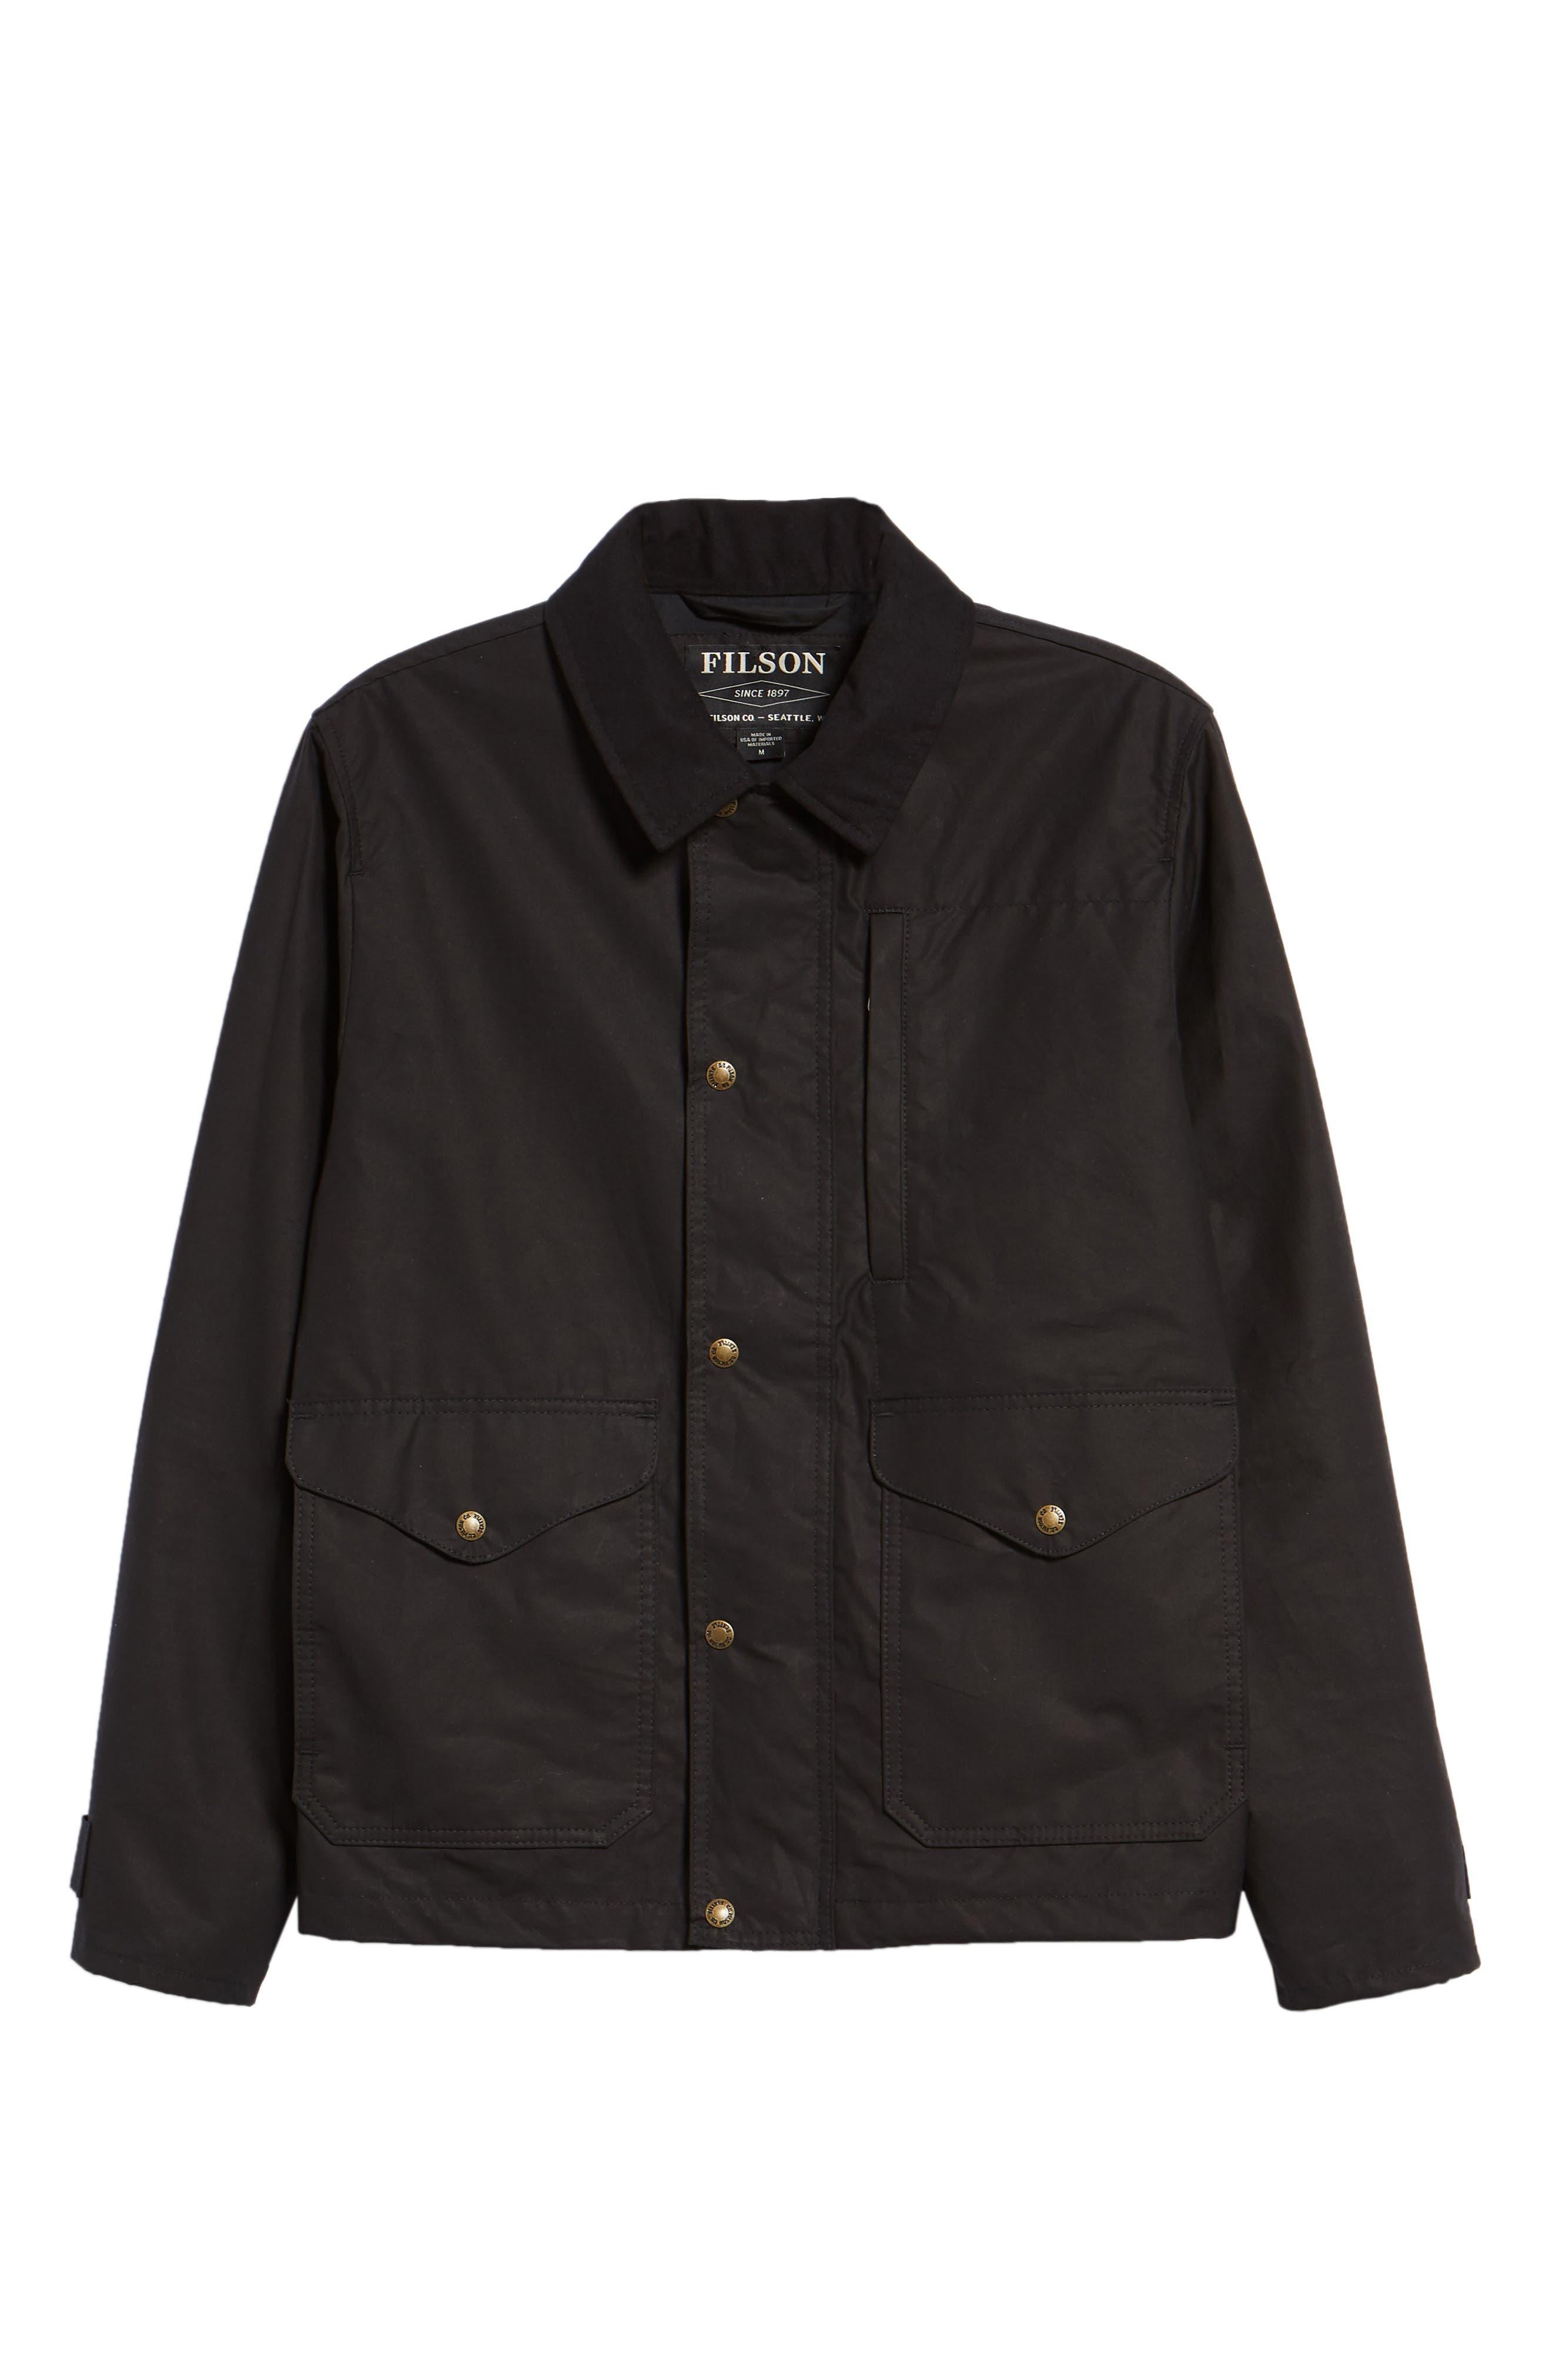 Short Mile Marker Waxed Cotton Jacket,                             Alternate thumbnail 6, color,                             BLACK